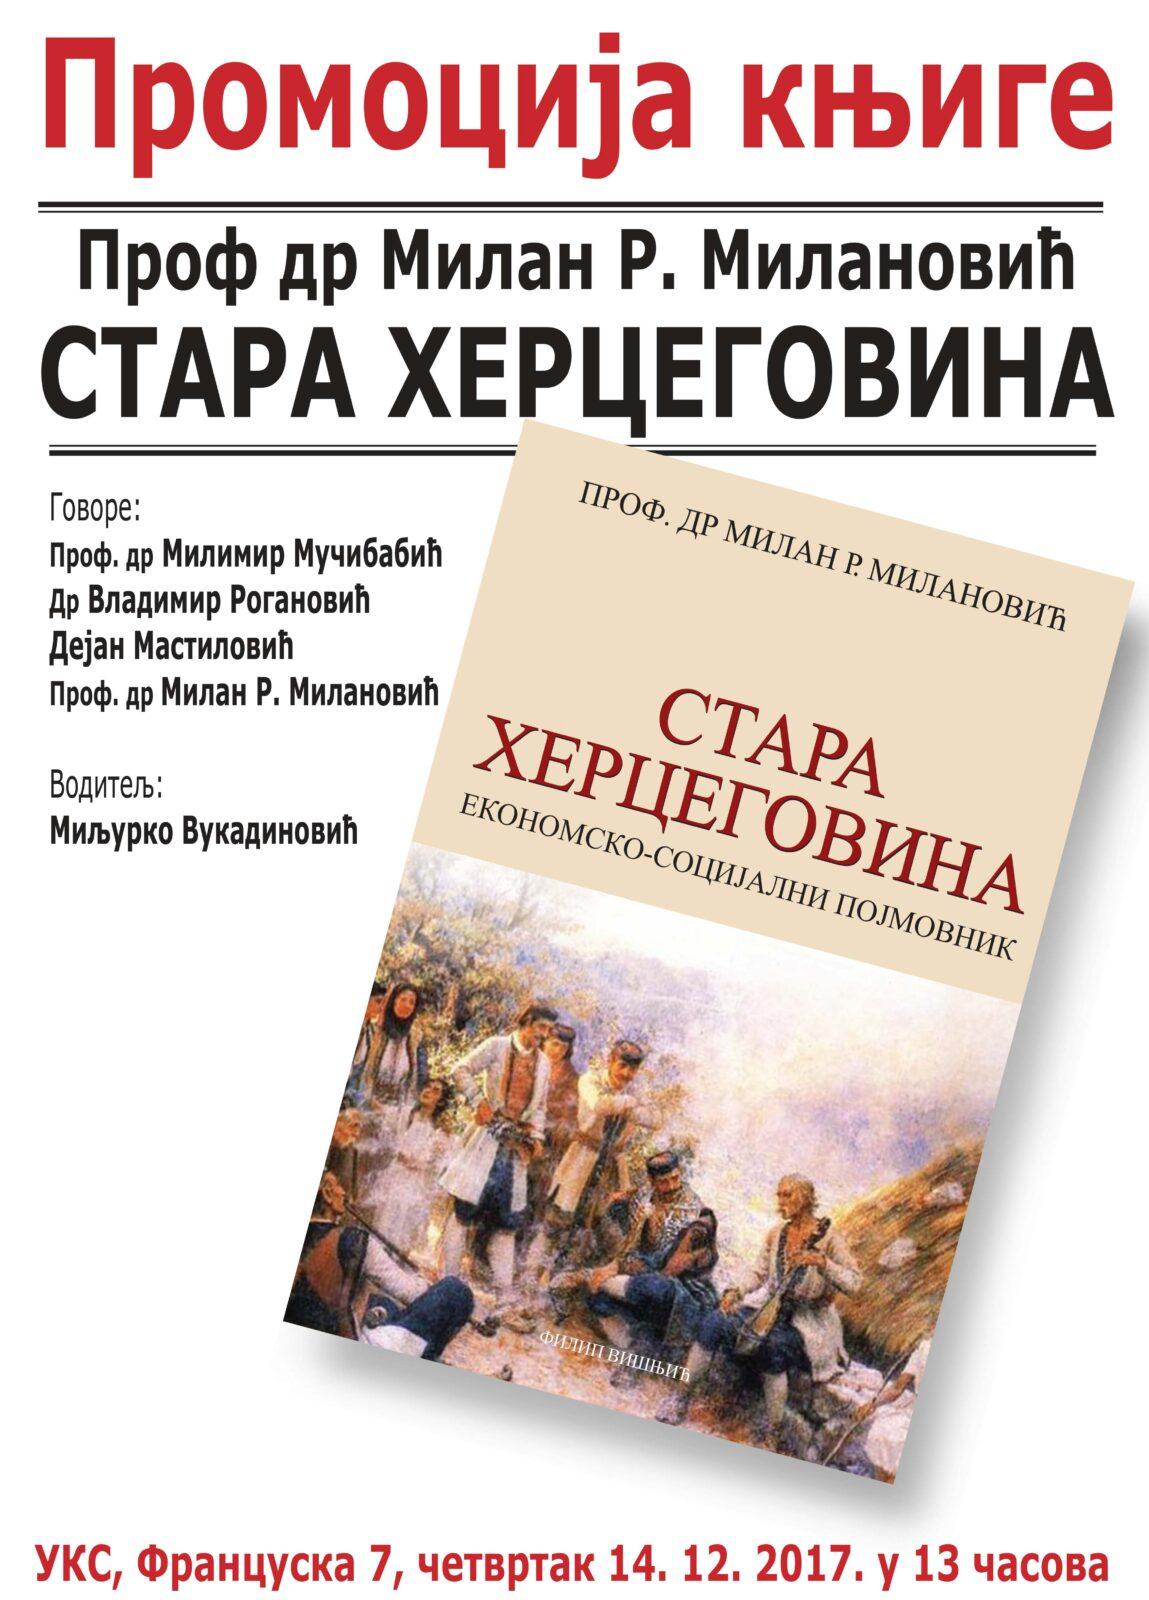 "BEOGRAD, 14. DECEMBAR 2017. GODINE: Promocija knjige dr Milana R. Milanovića ""Stara Hercegovina"""